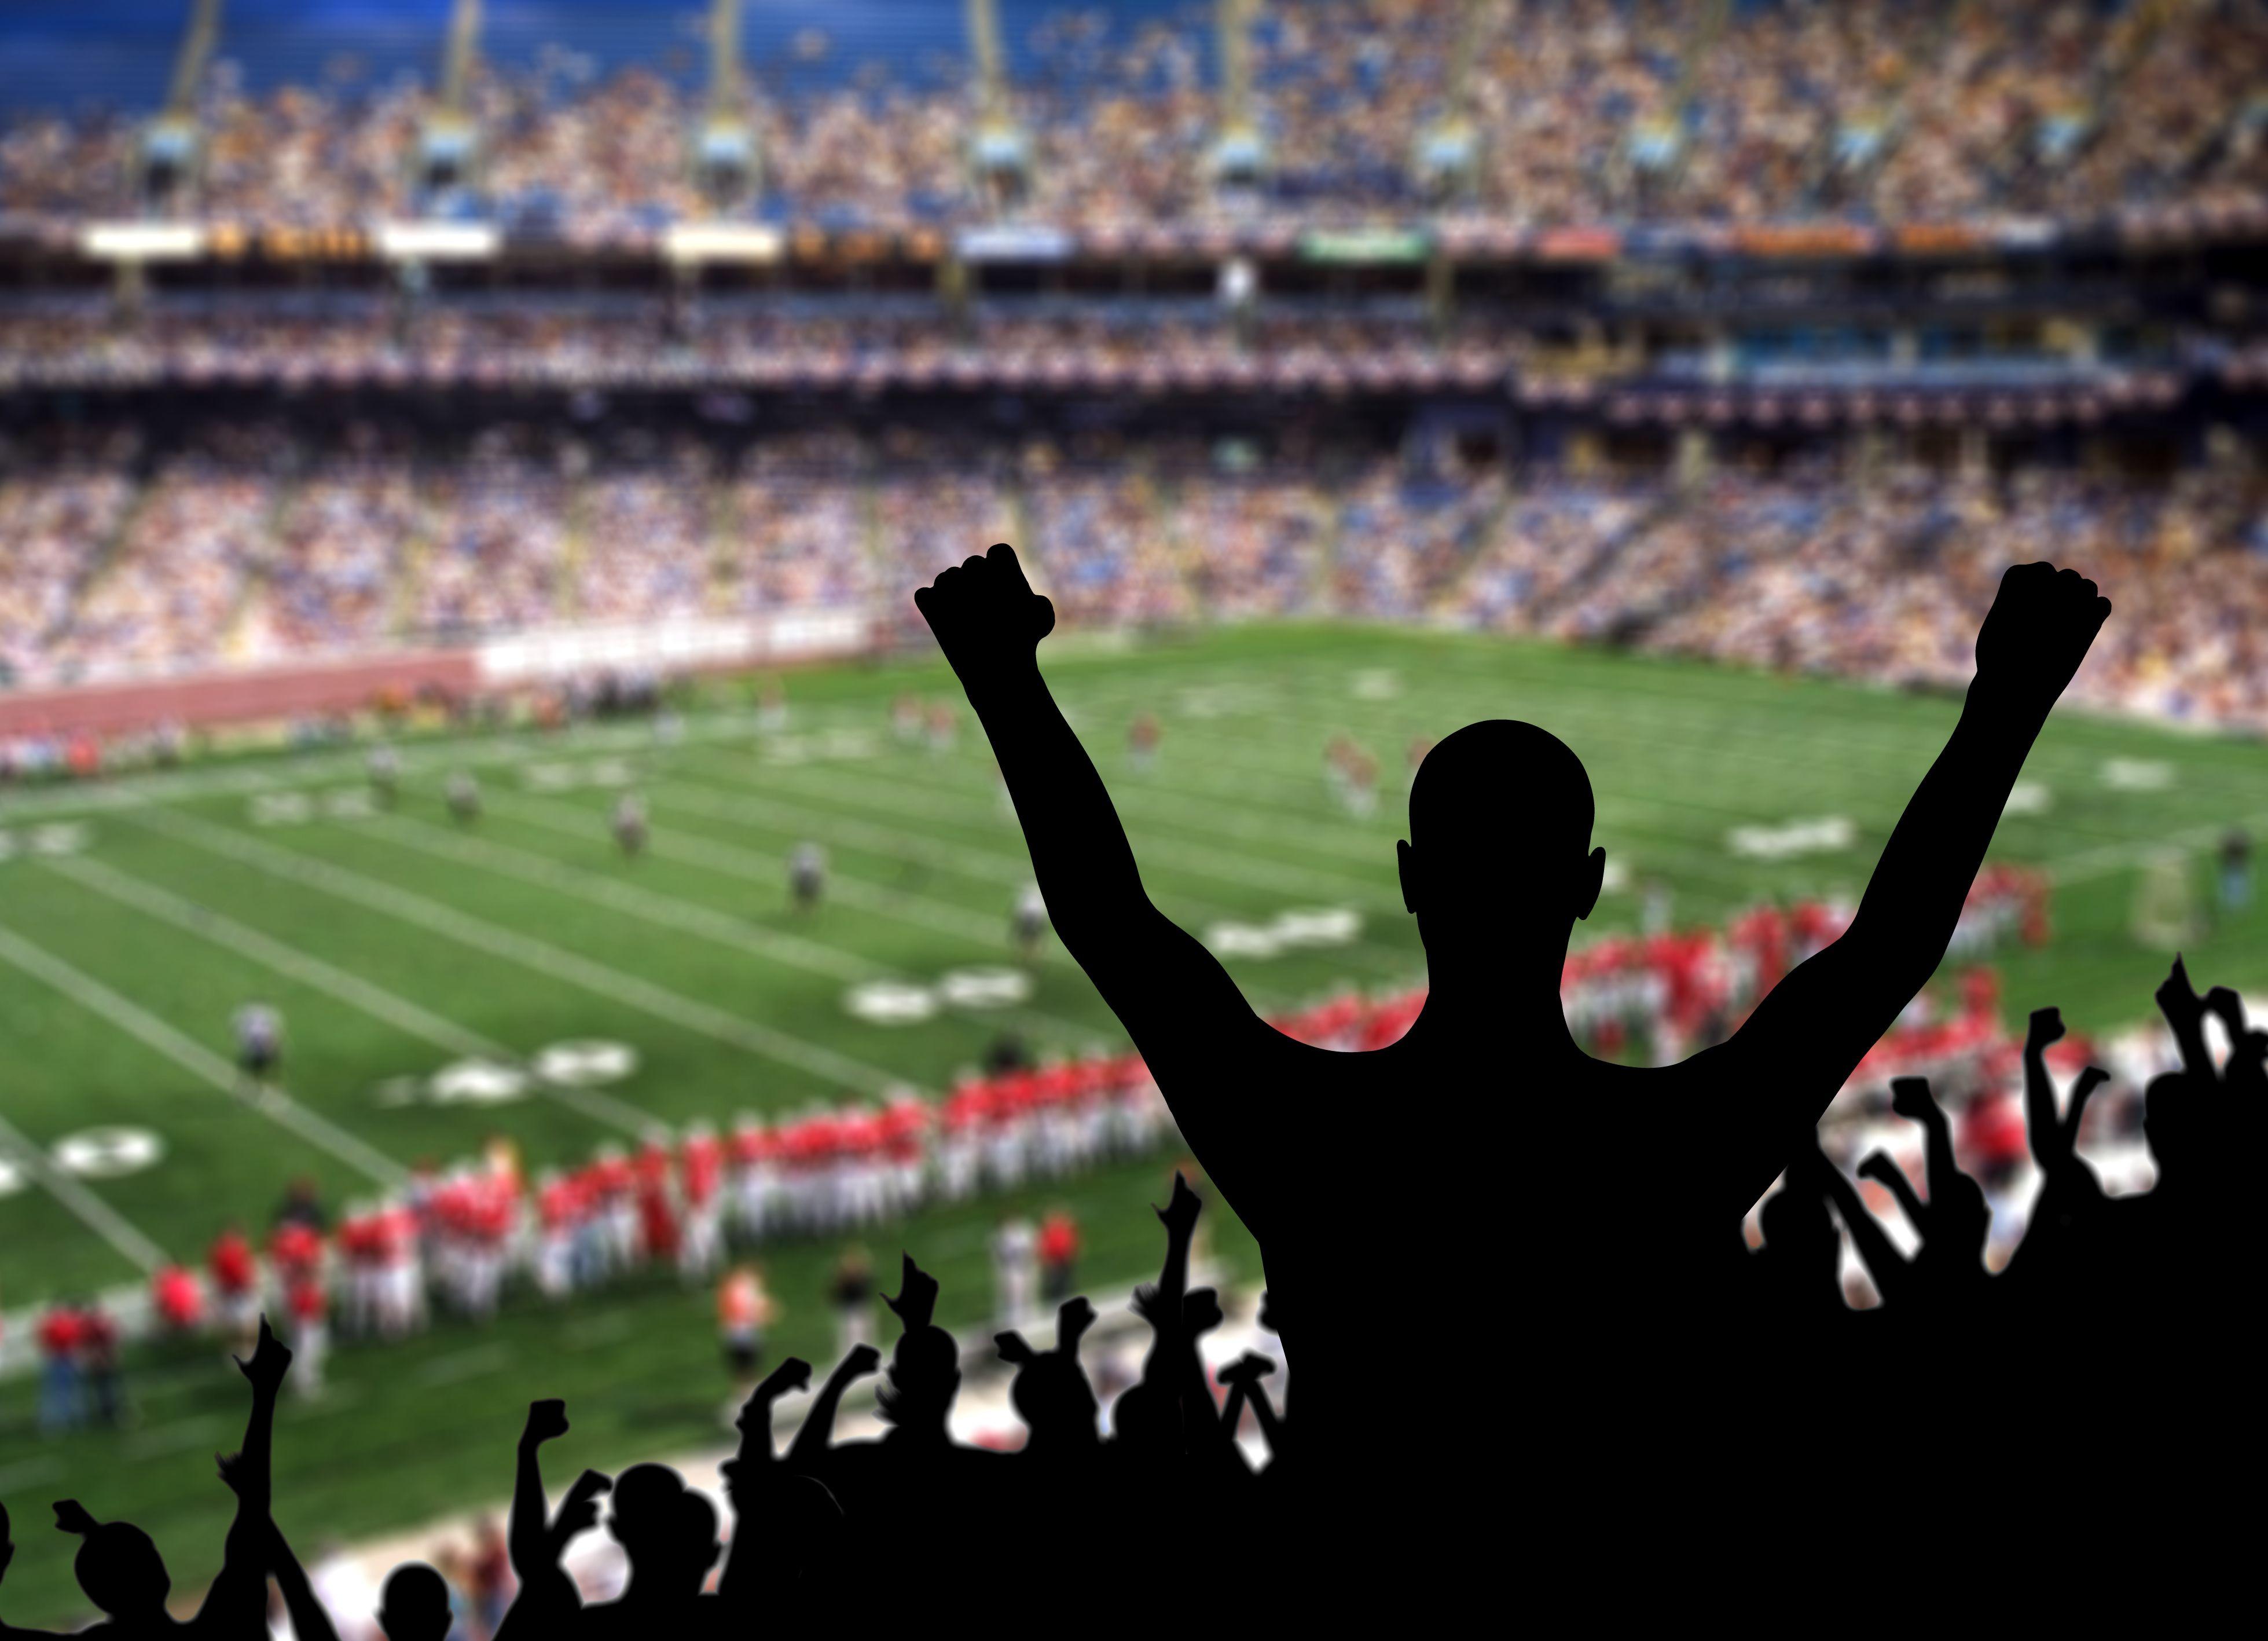 10 Most Popular Sports In America